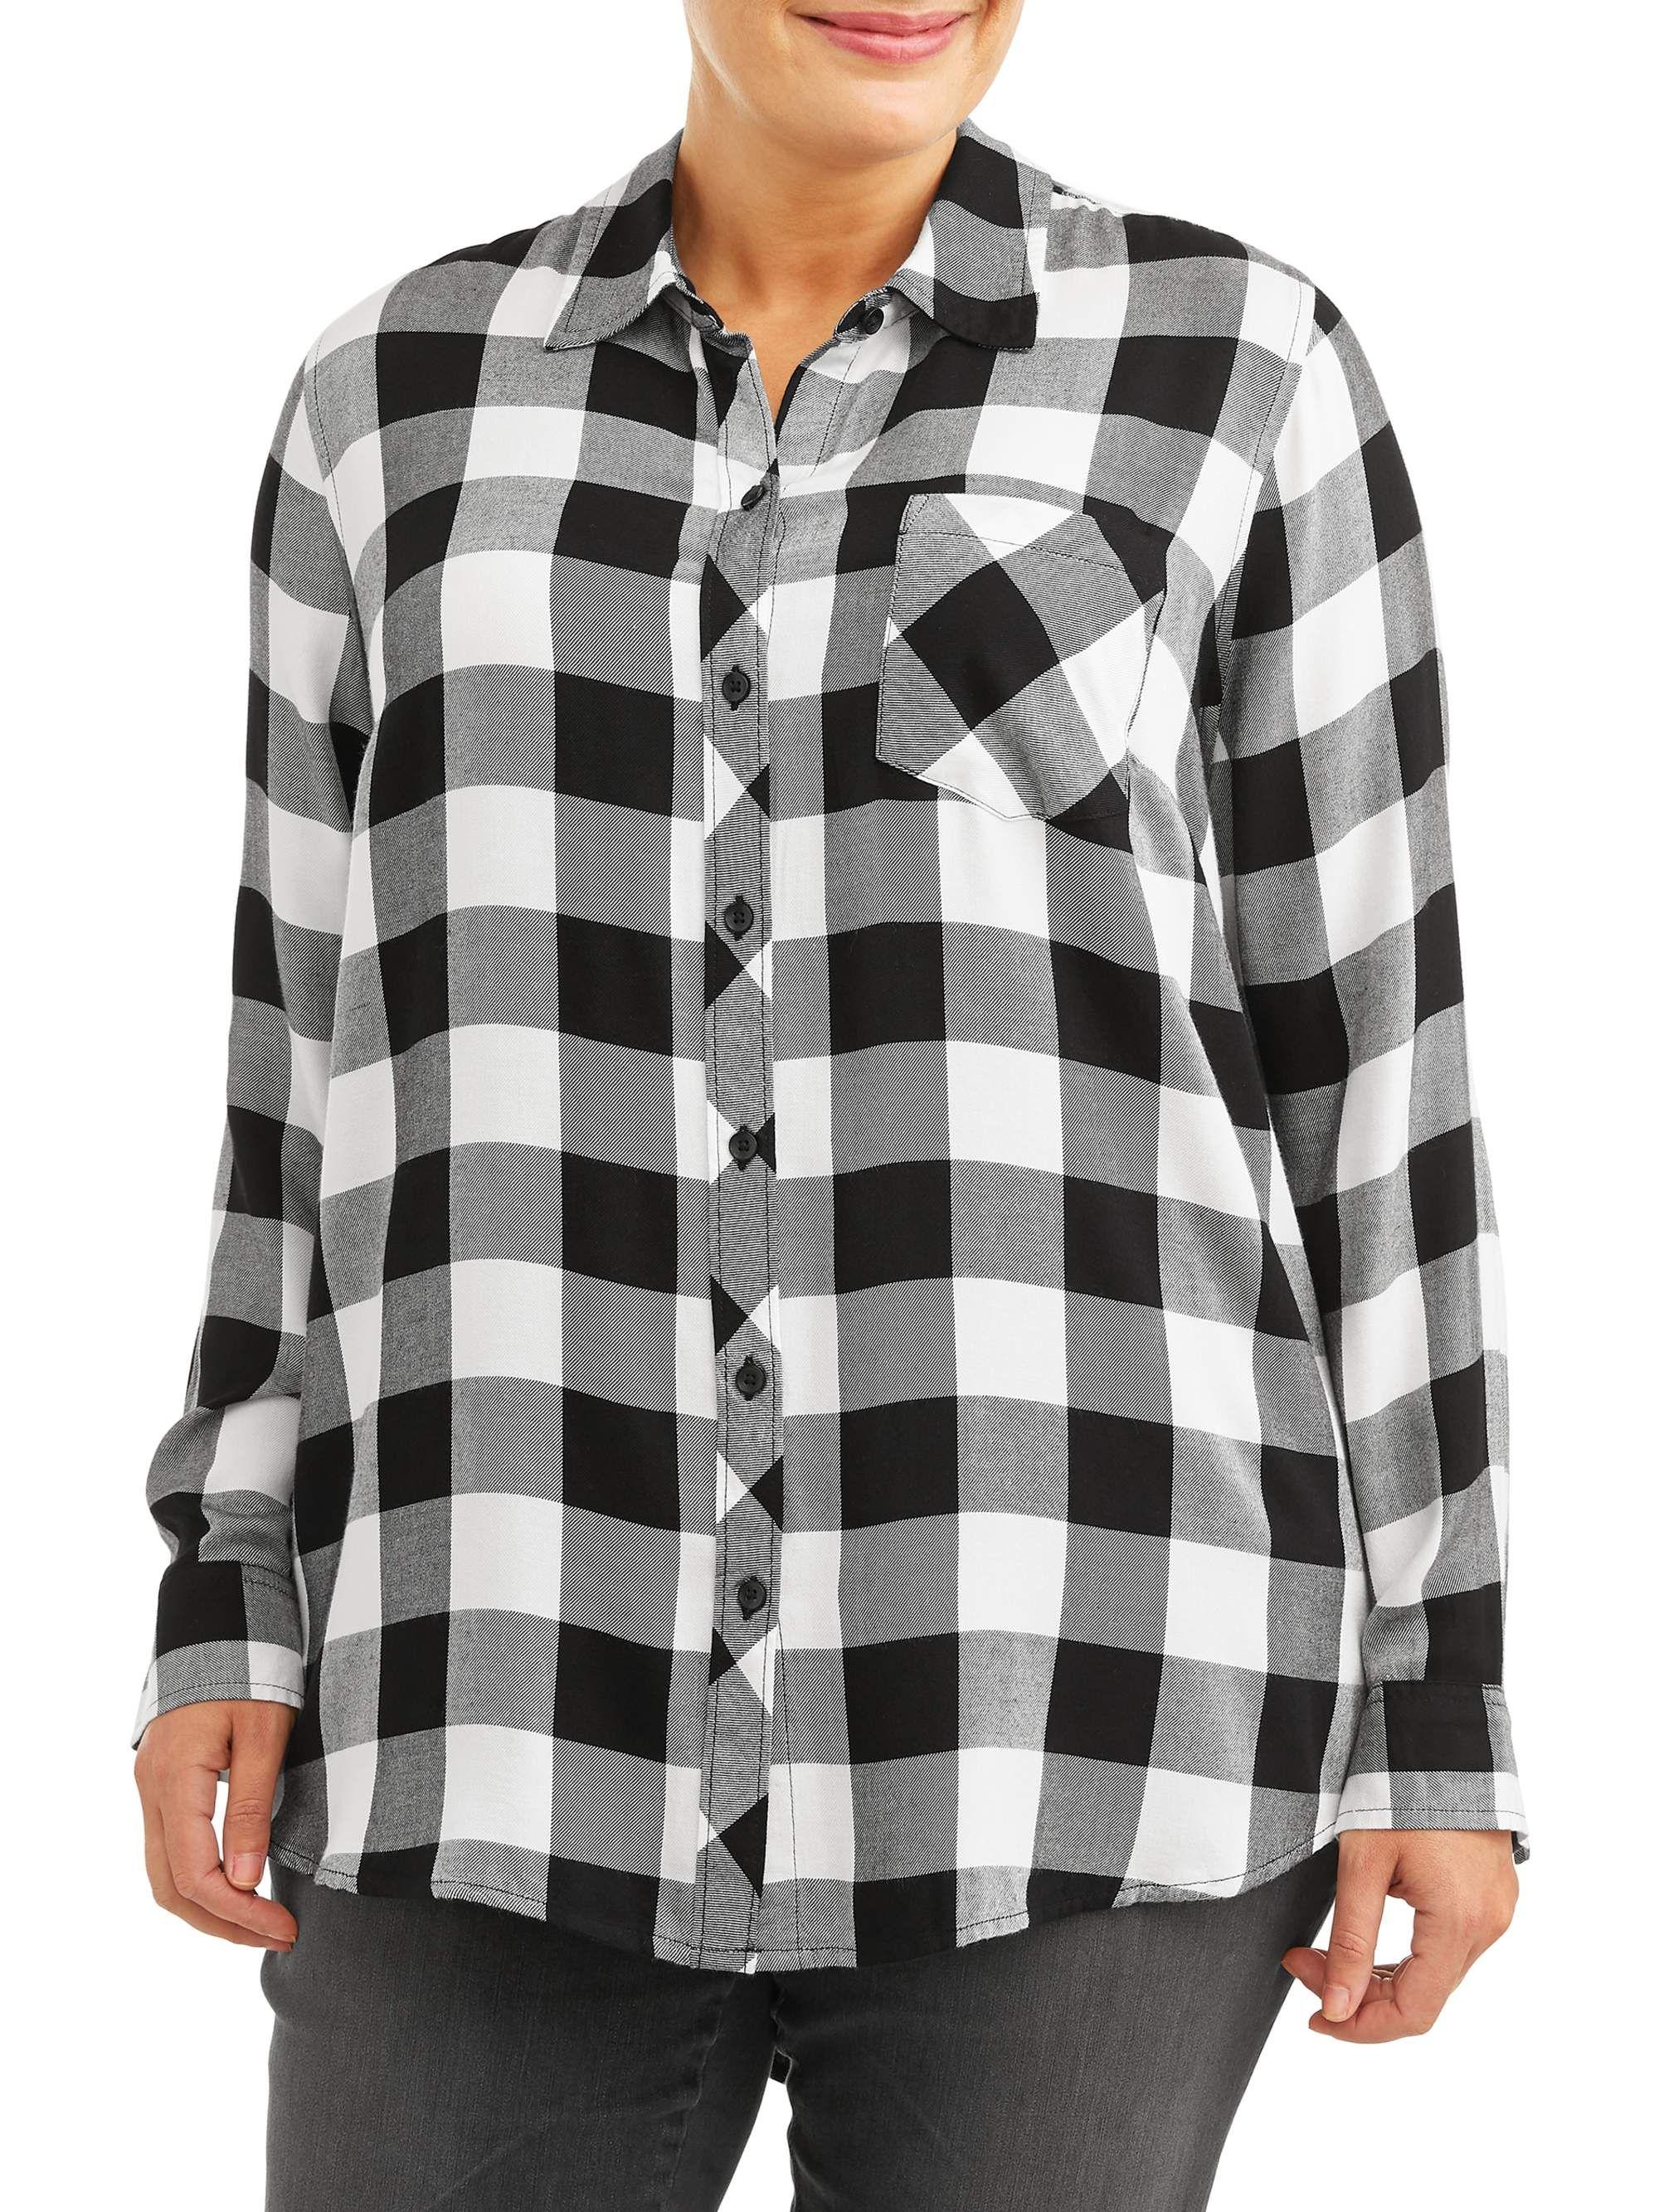 Terra Sky Terra And Sky Women S Plus Size One Pocket Plaid Button Down Shirt Walmart Com Shirts Button Down Shirt Plaid [ 2667 x 2000 Pixel ]